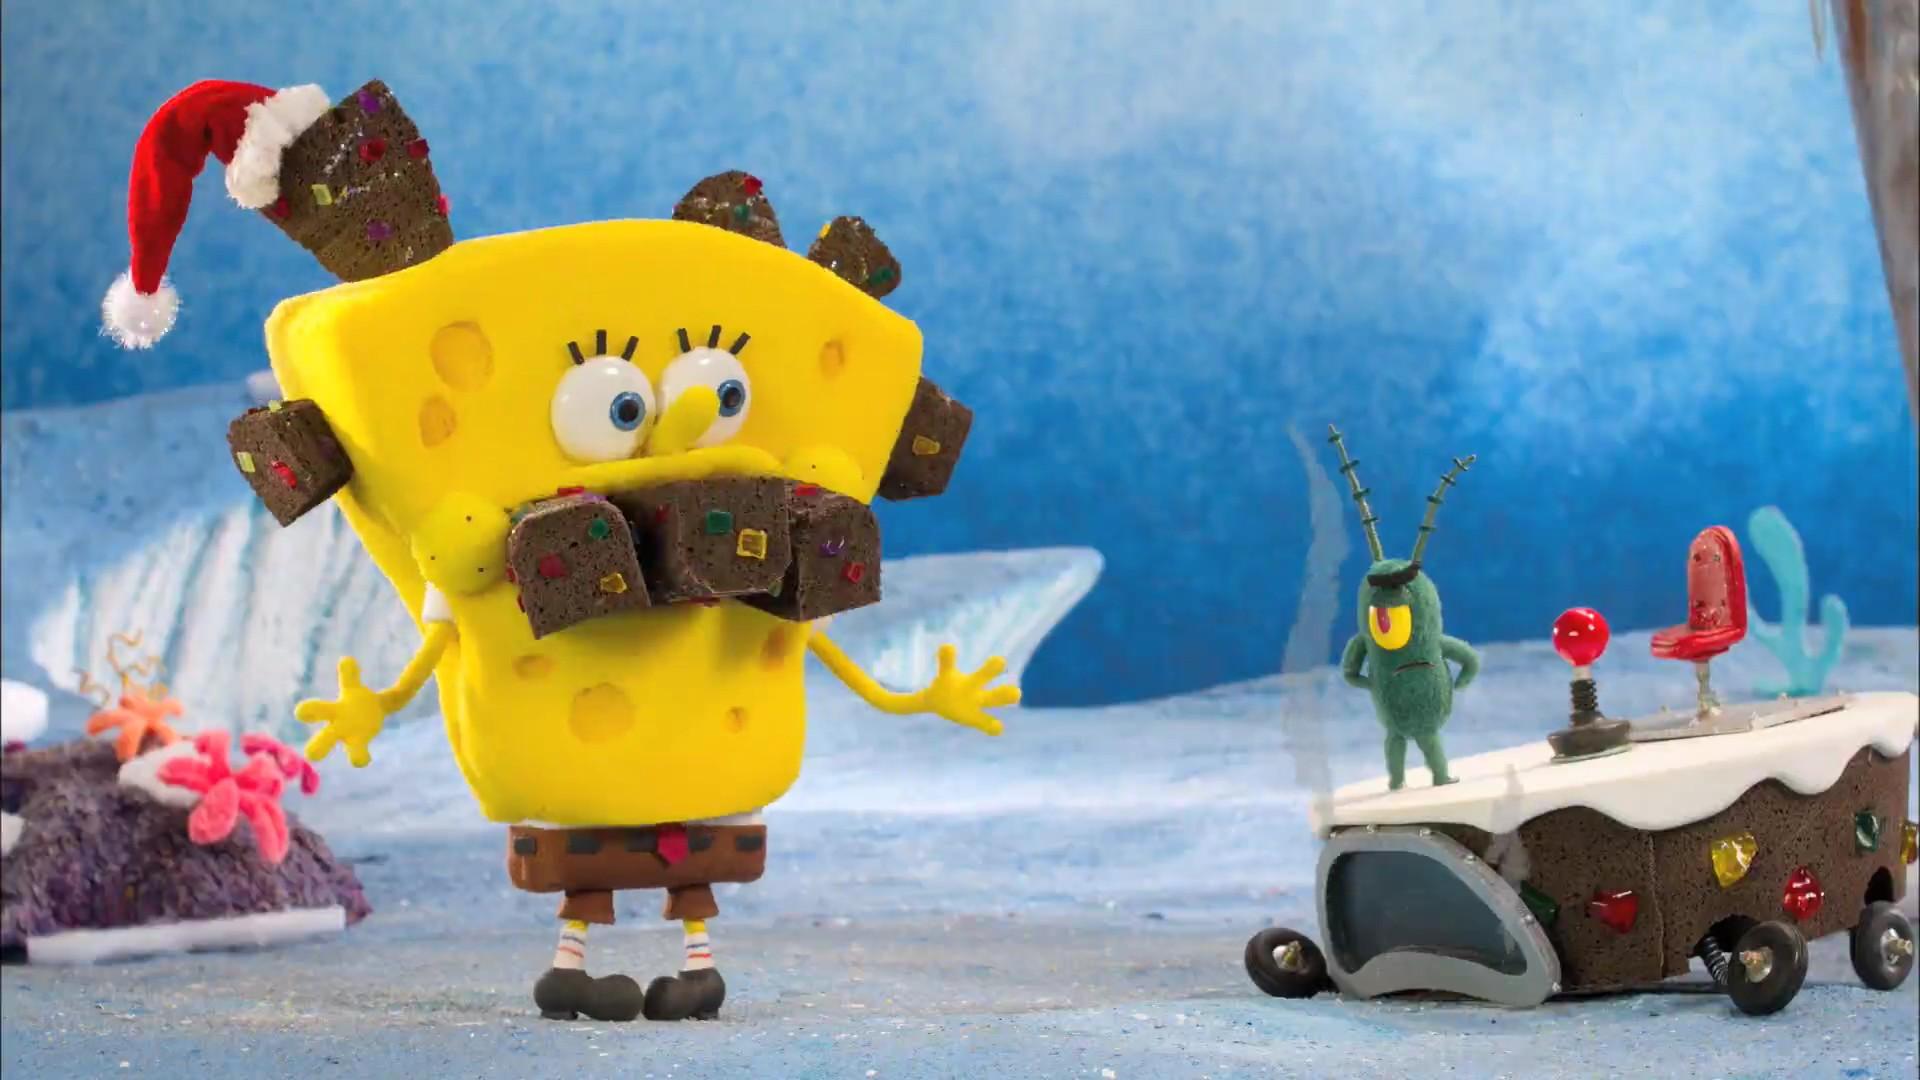 spongebob squarepants funny humor christmas f wallpaper | 1920x1080